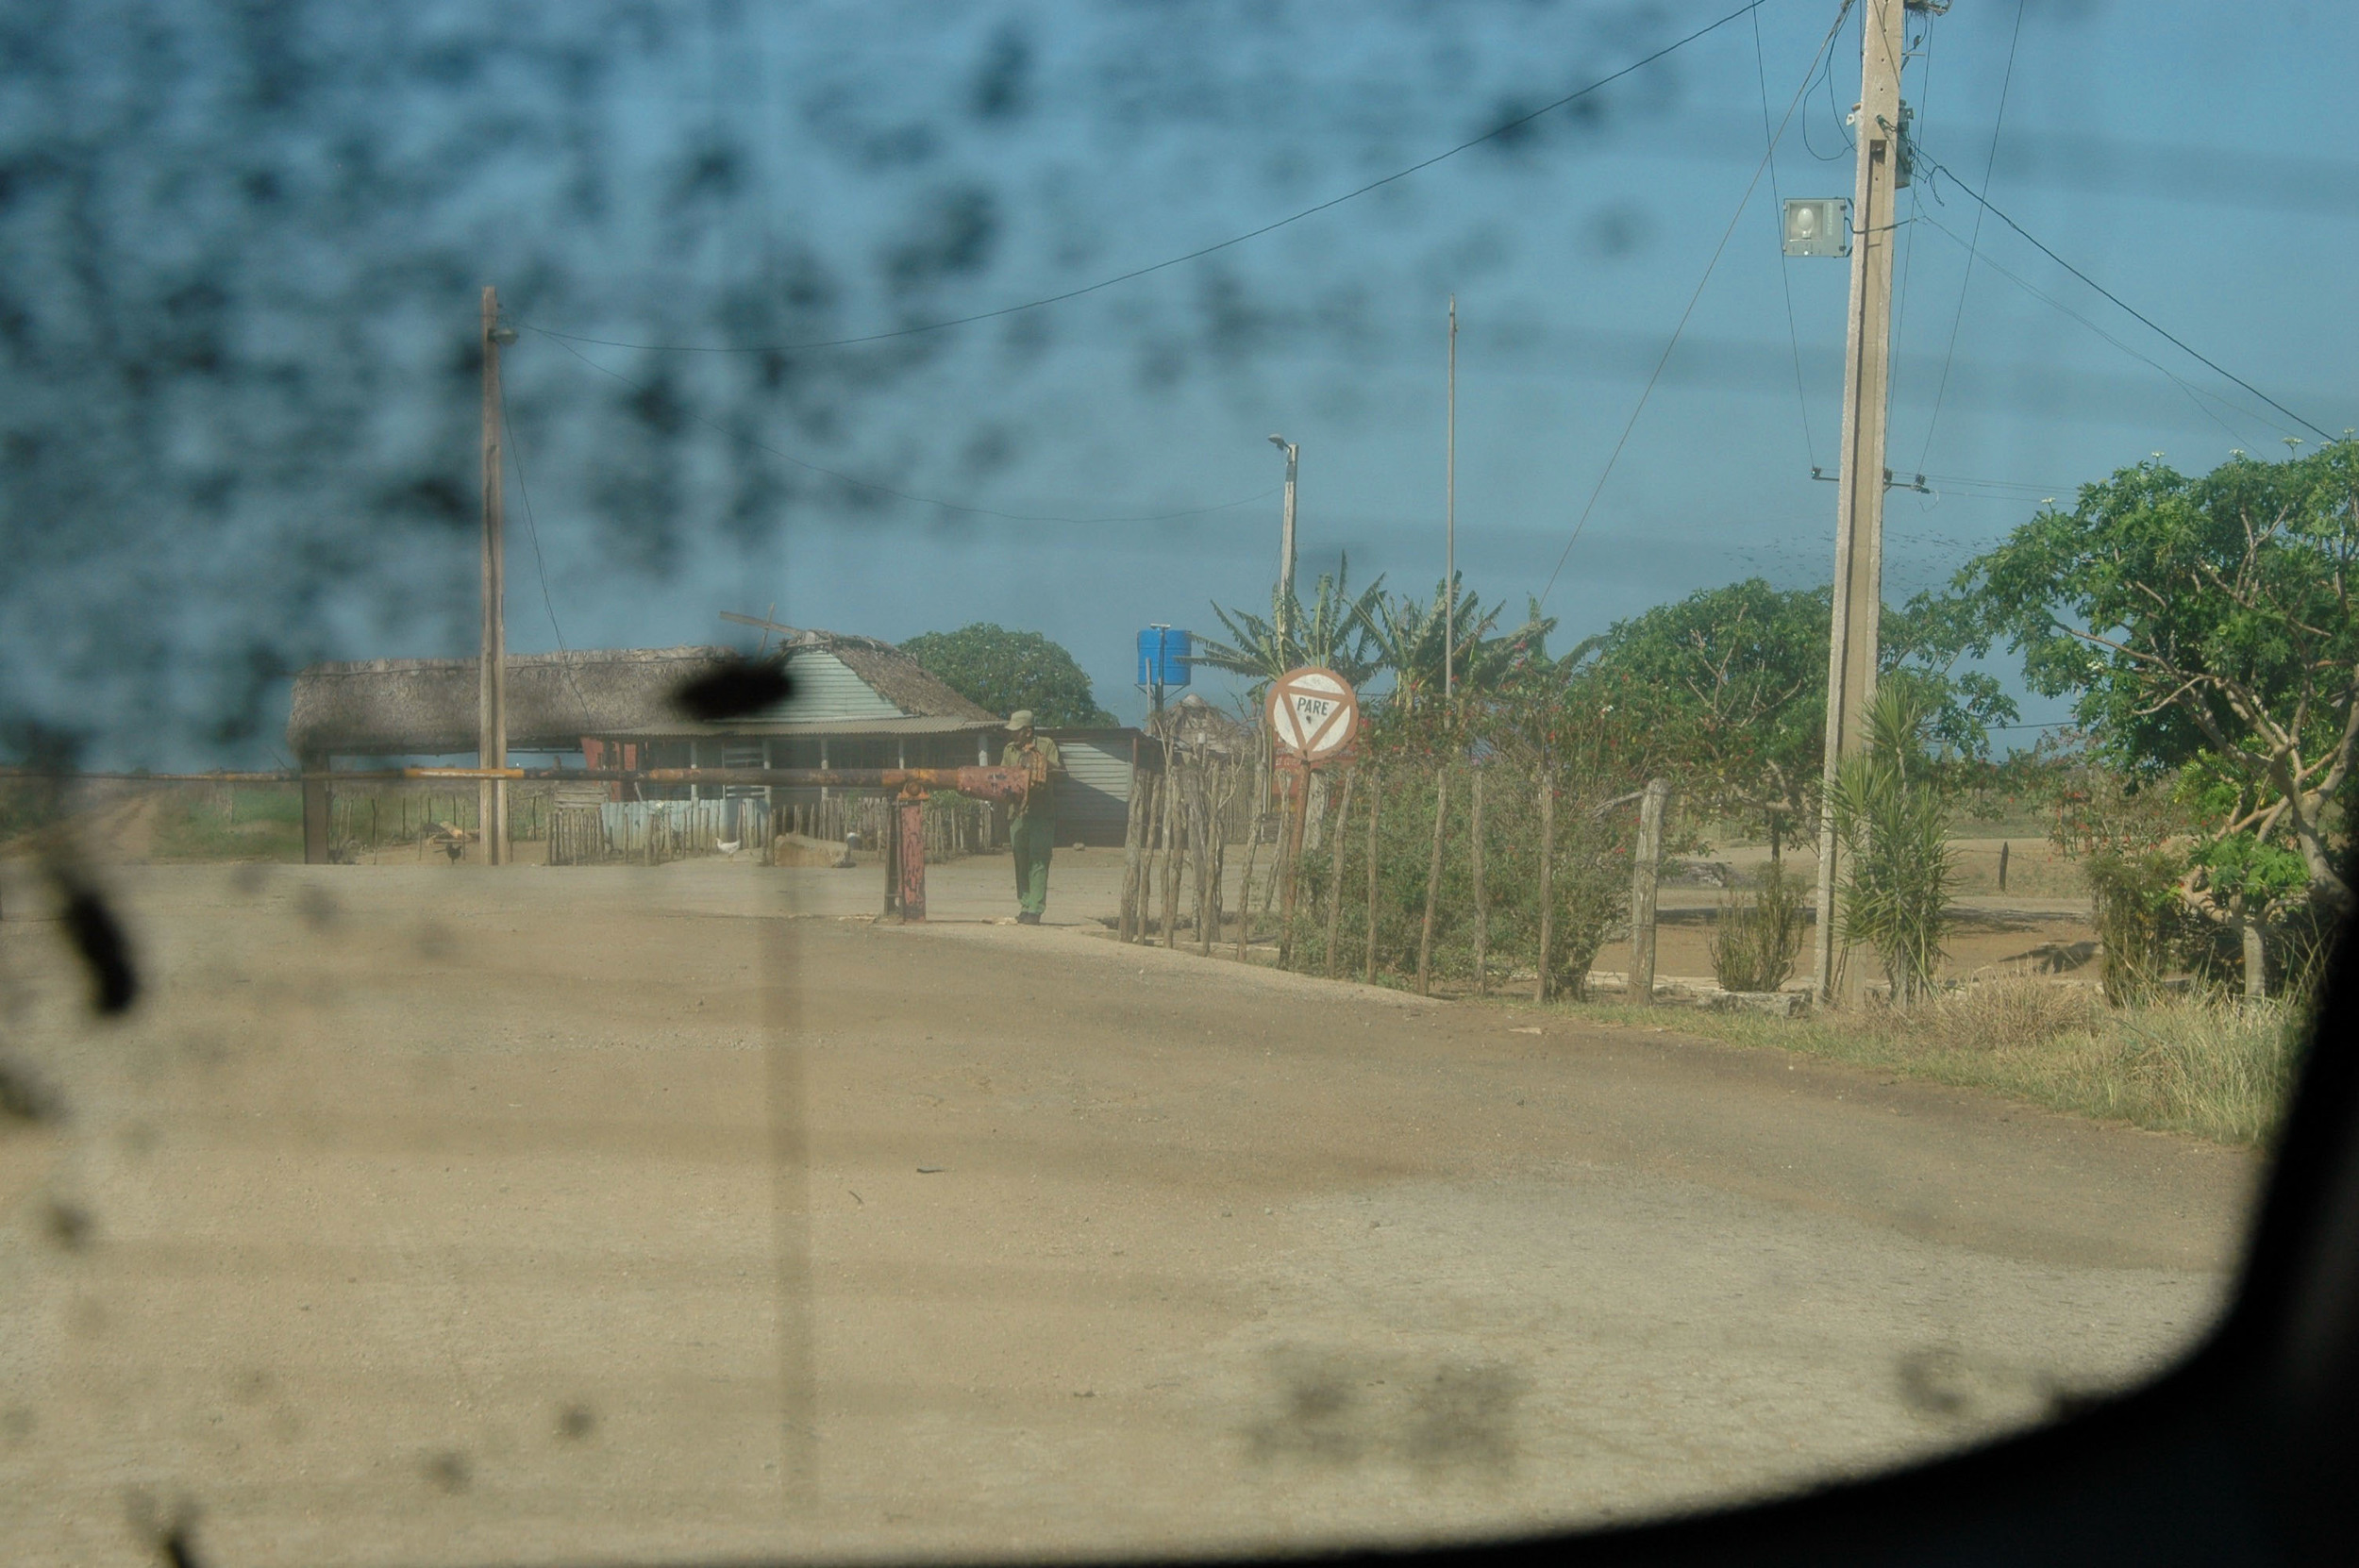 Hindsight rear window shot